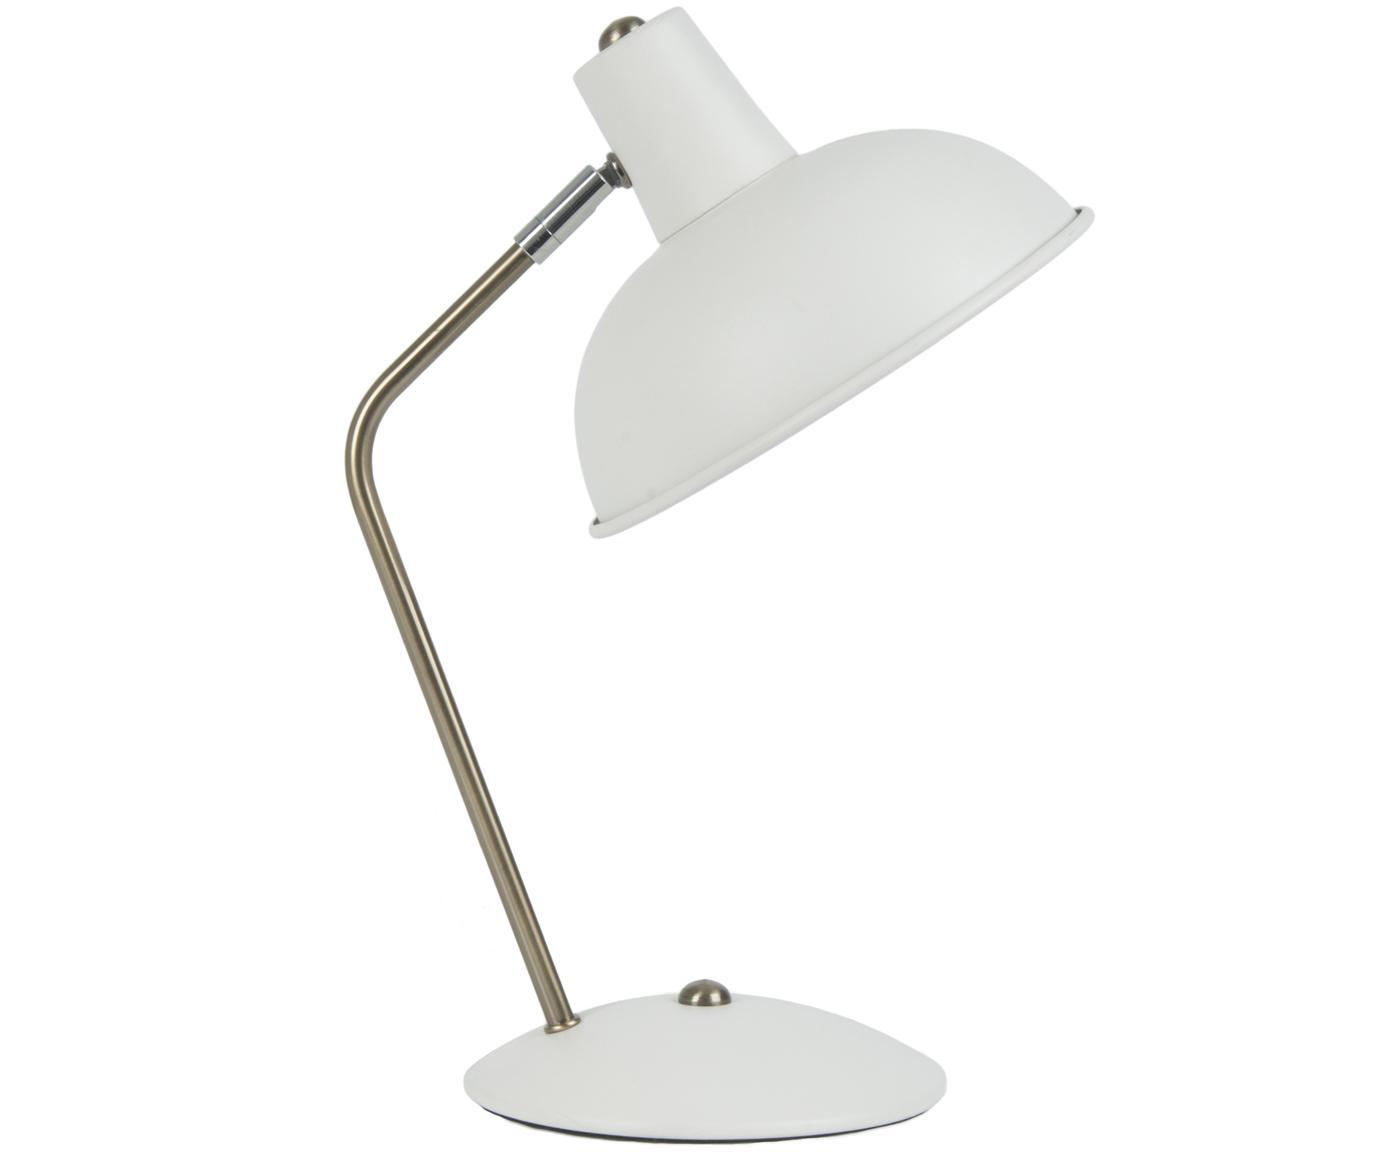 Lámpara de mesa Hood, estilo retro, Blanco, latón, An 20 x Al 38 cm